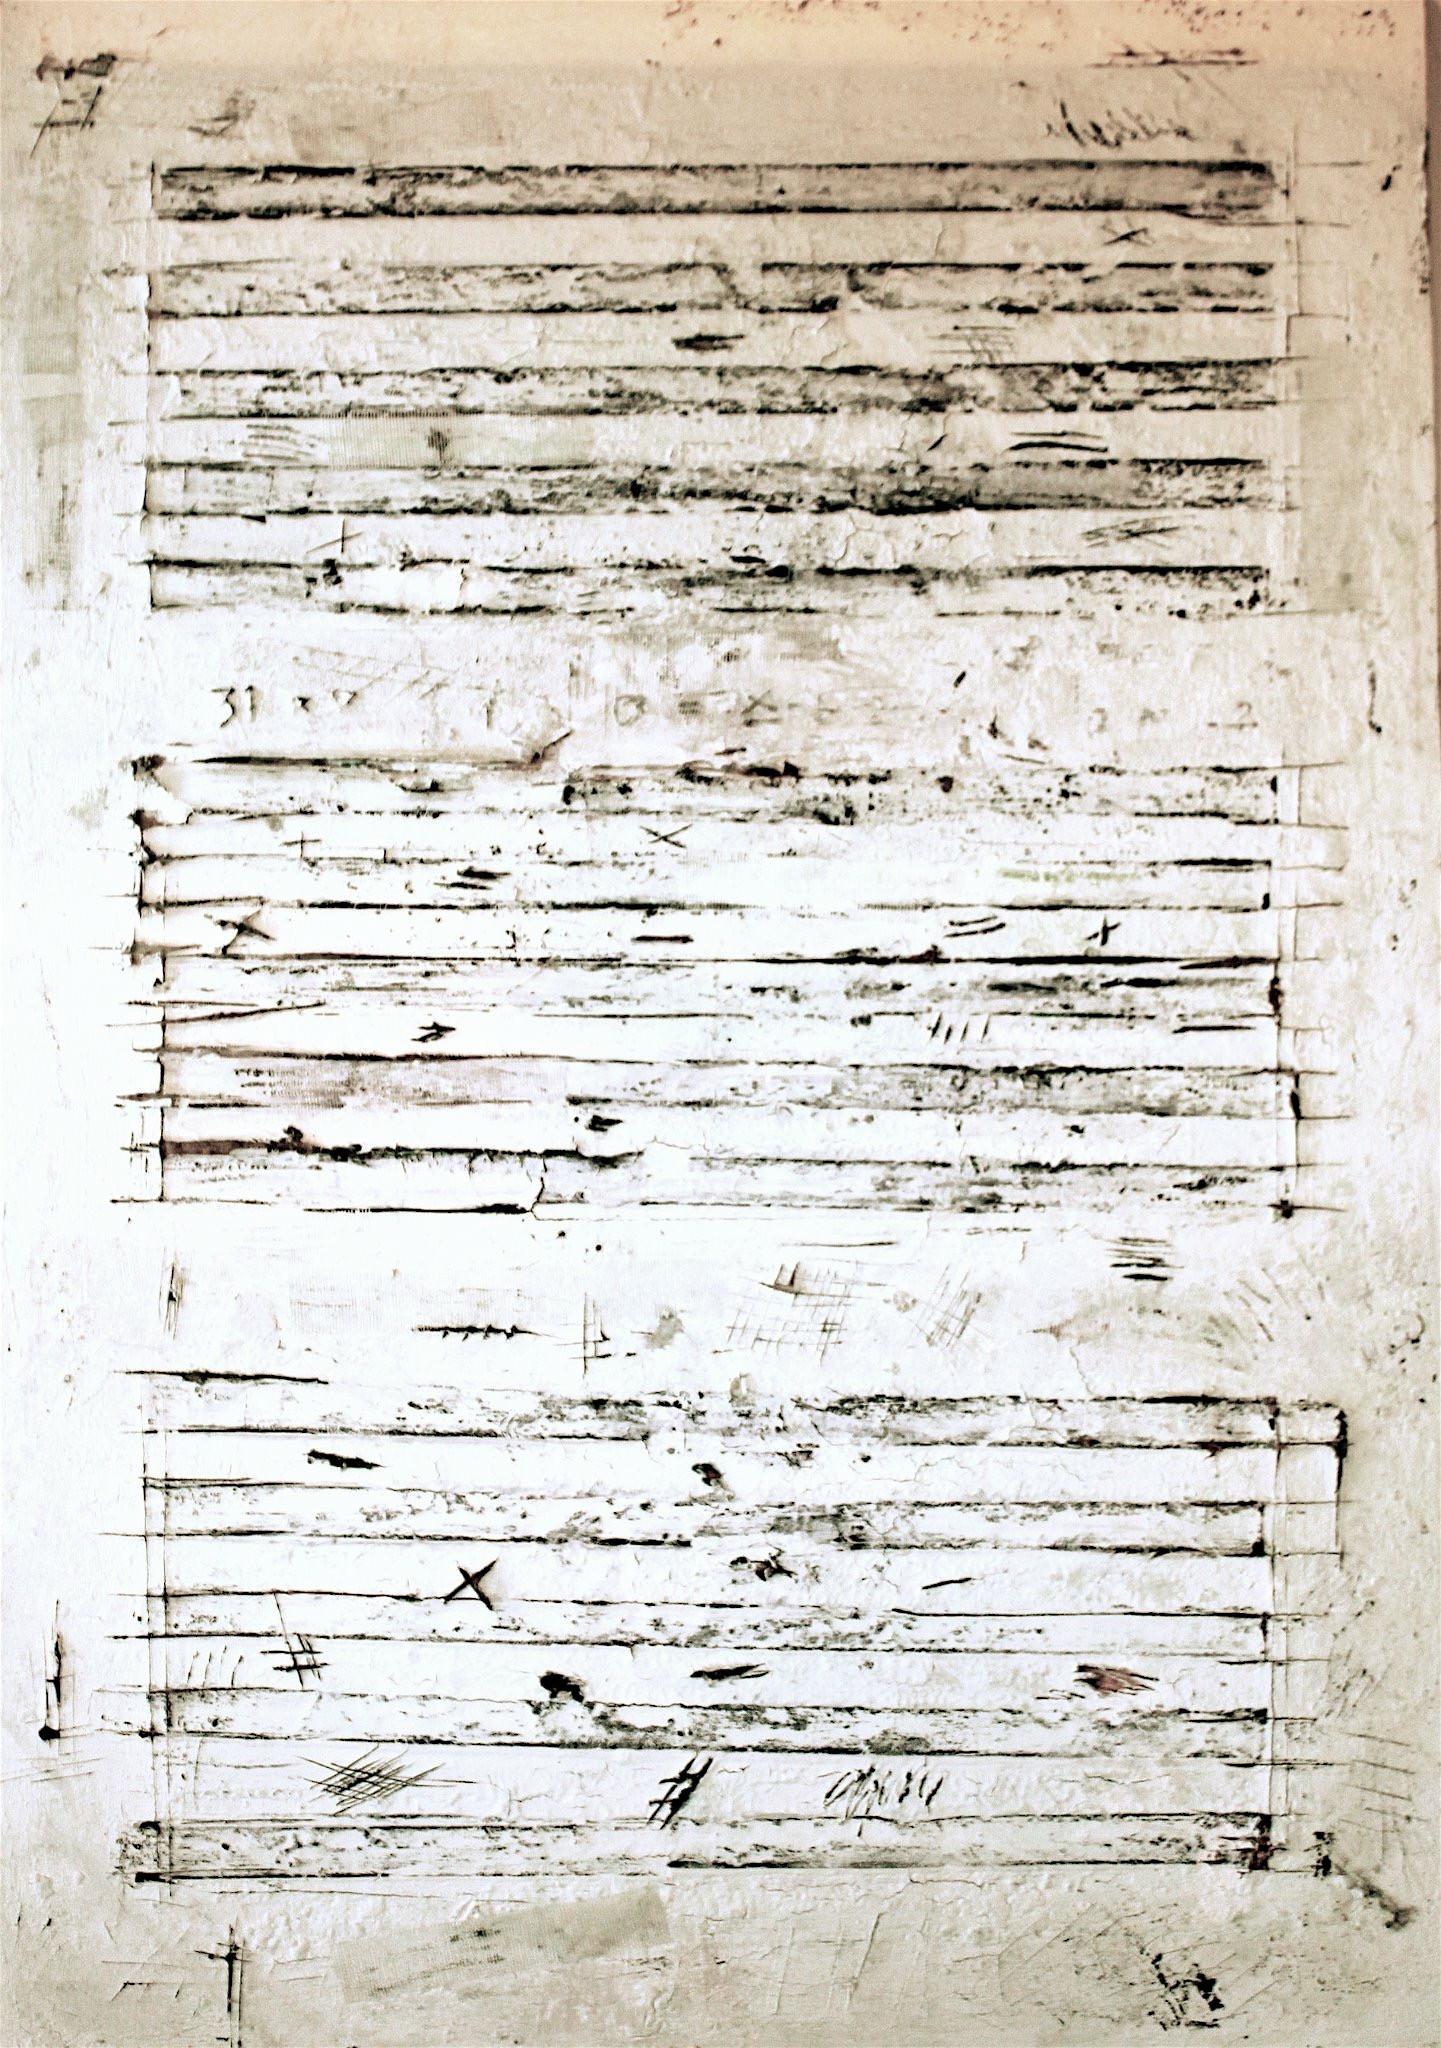 Partitura Blanca No. 1